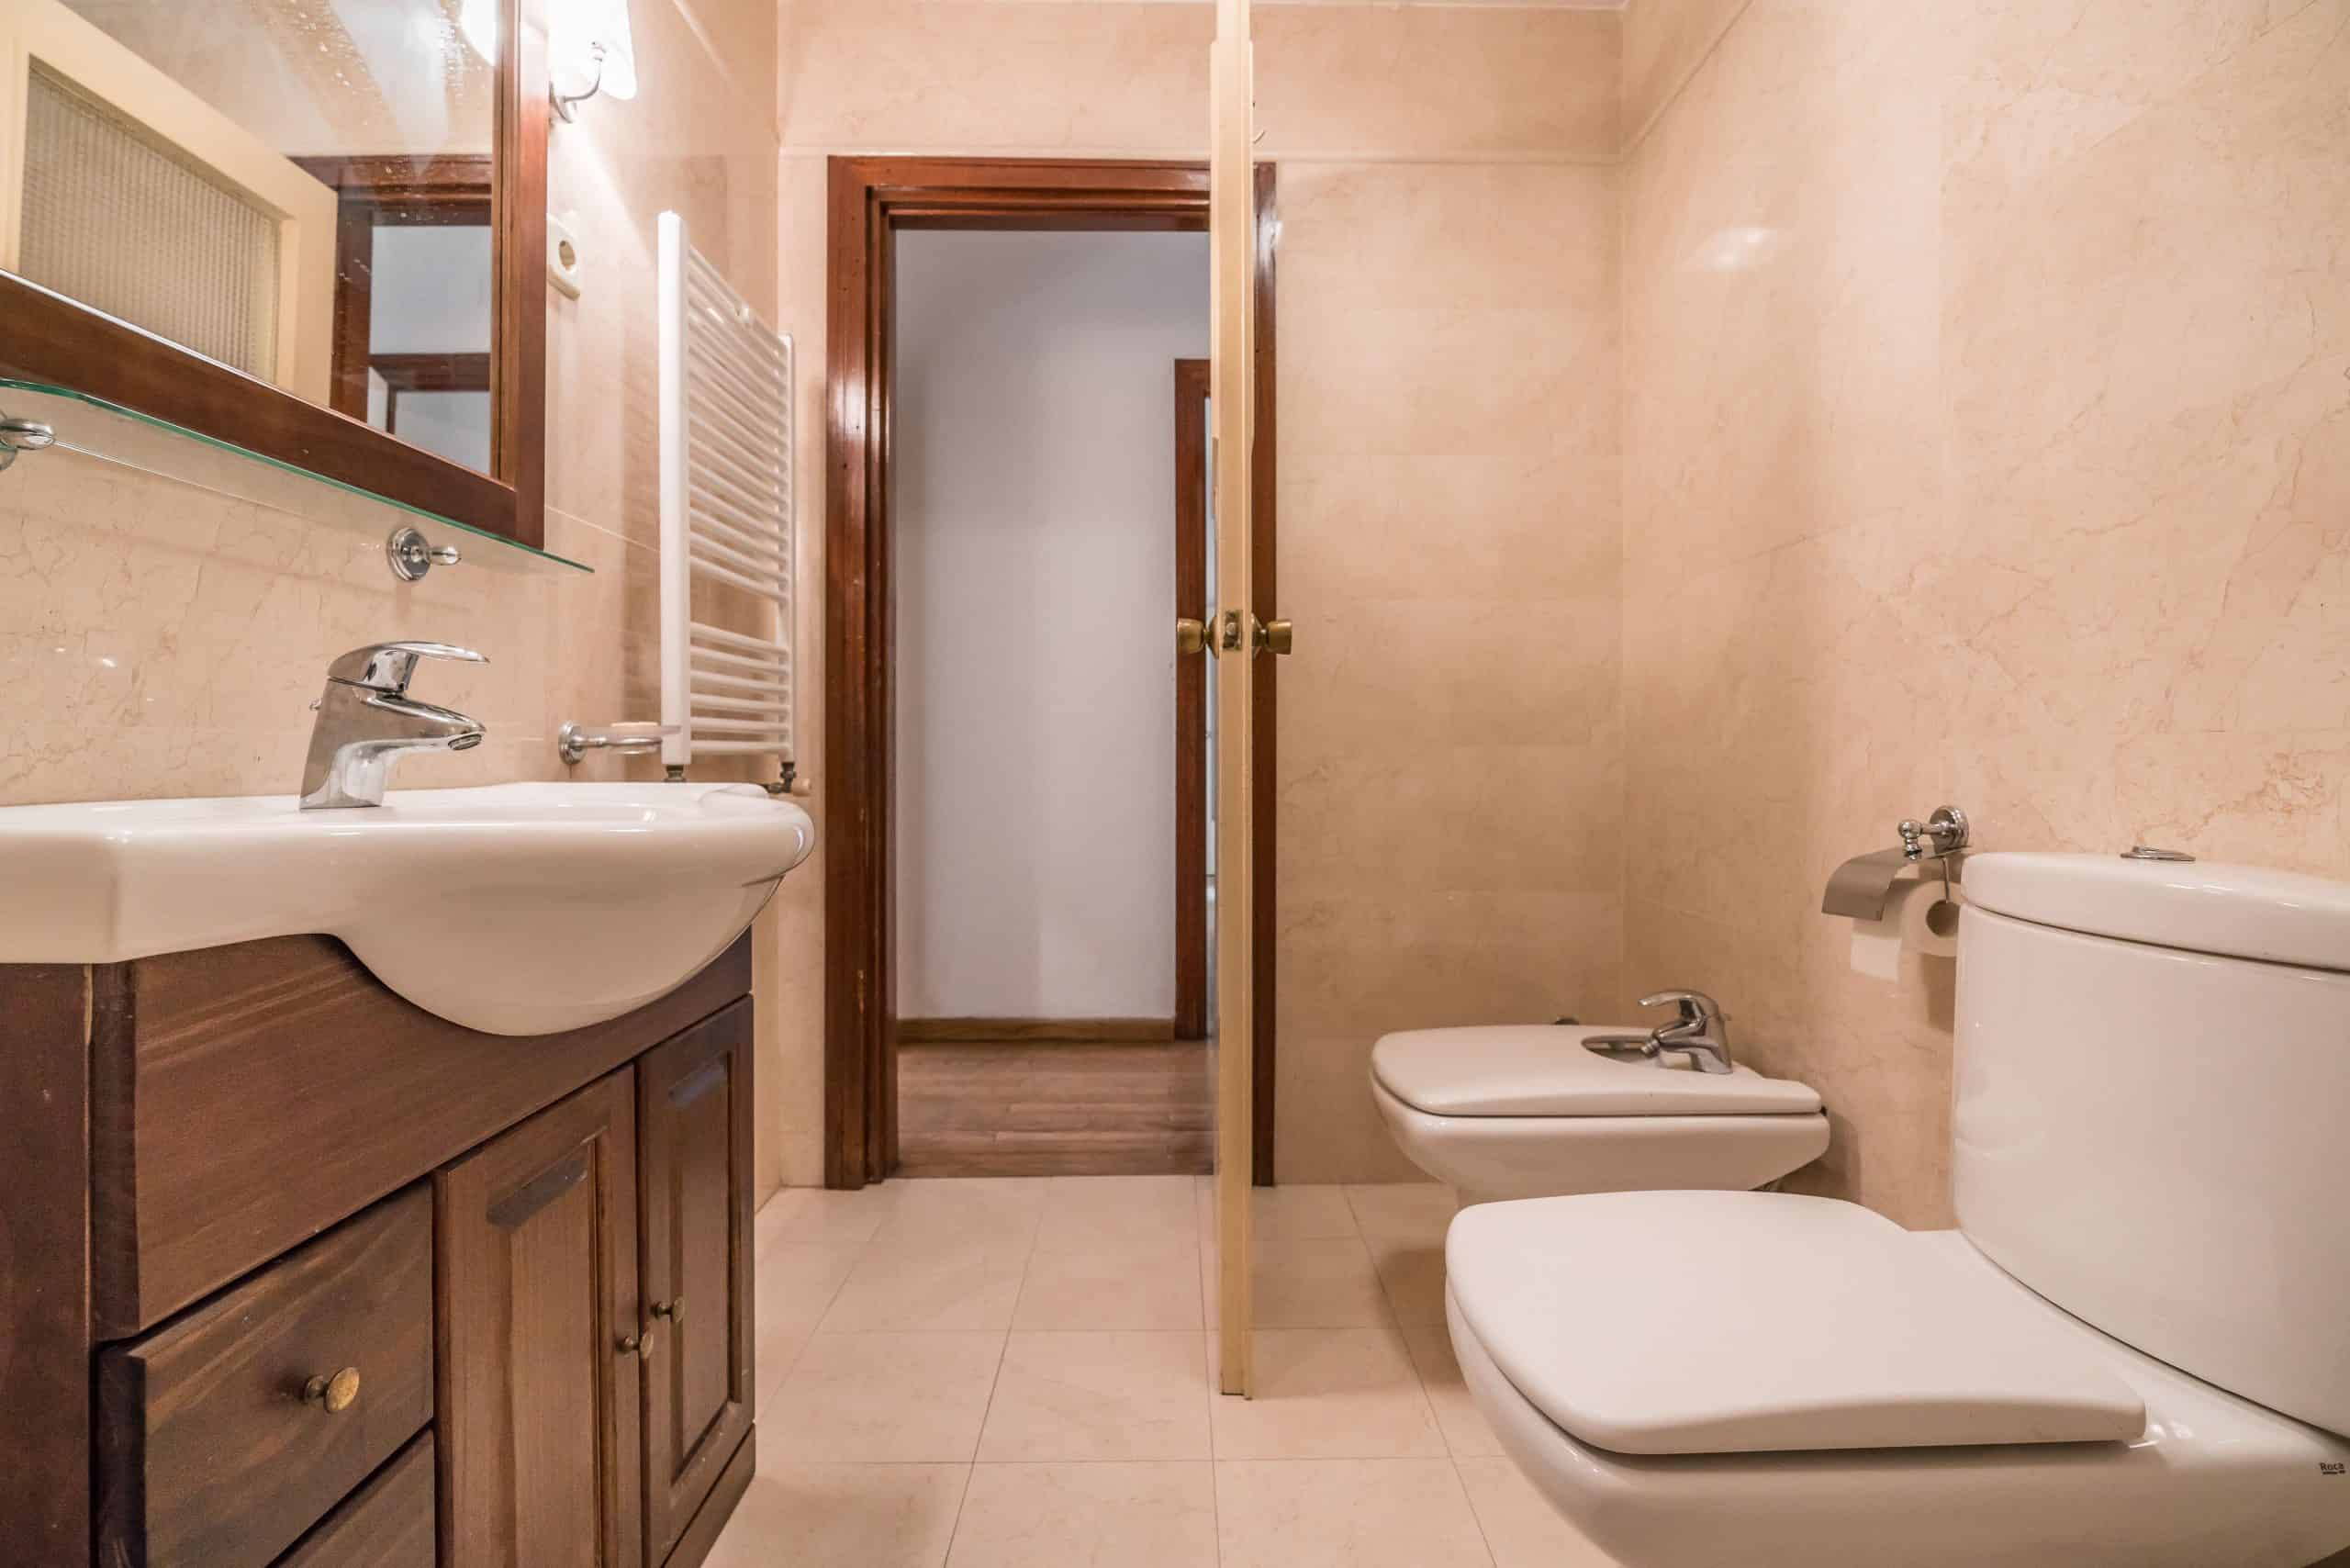 Agencia Inmobiliaria de Madrid-FUTUROCASA-Zona ARGANZUELA-EMBAJADORES-LEGAZPI -calle Embajadores- baño 21